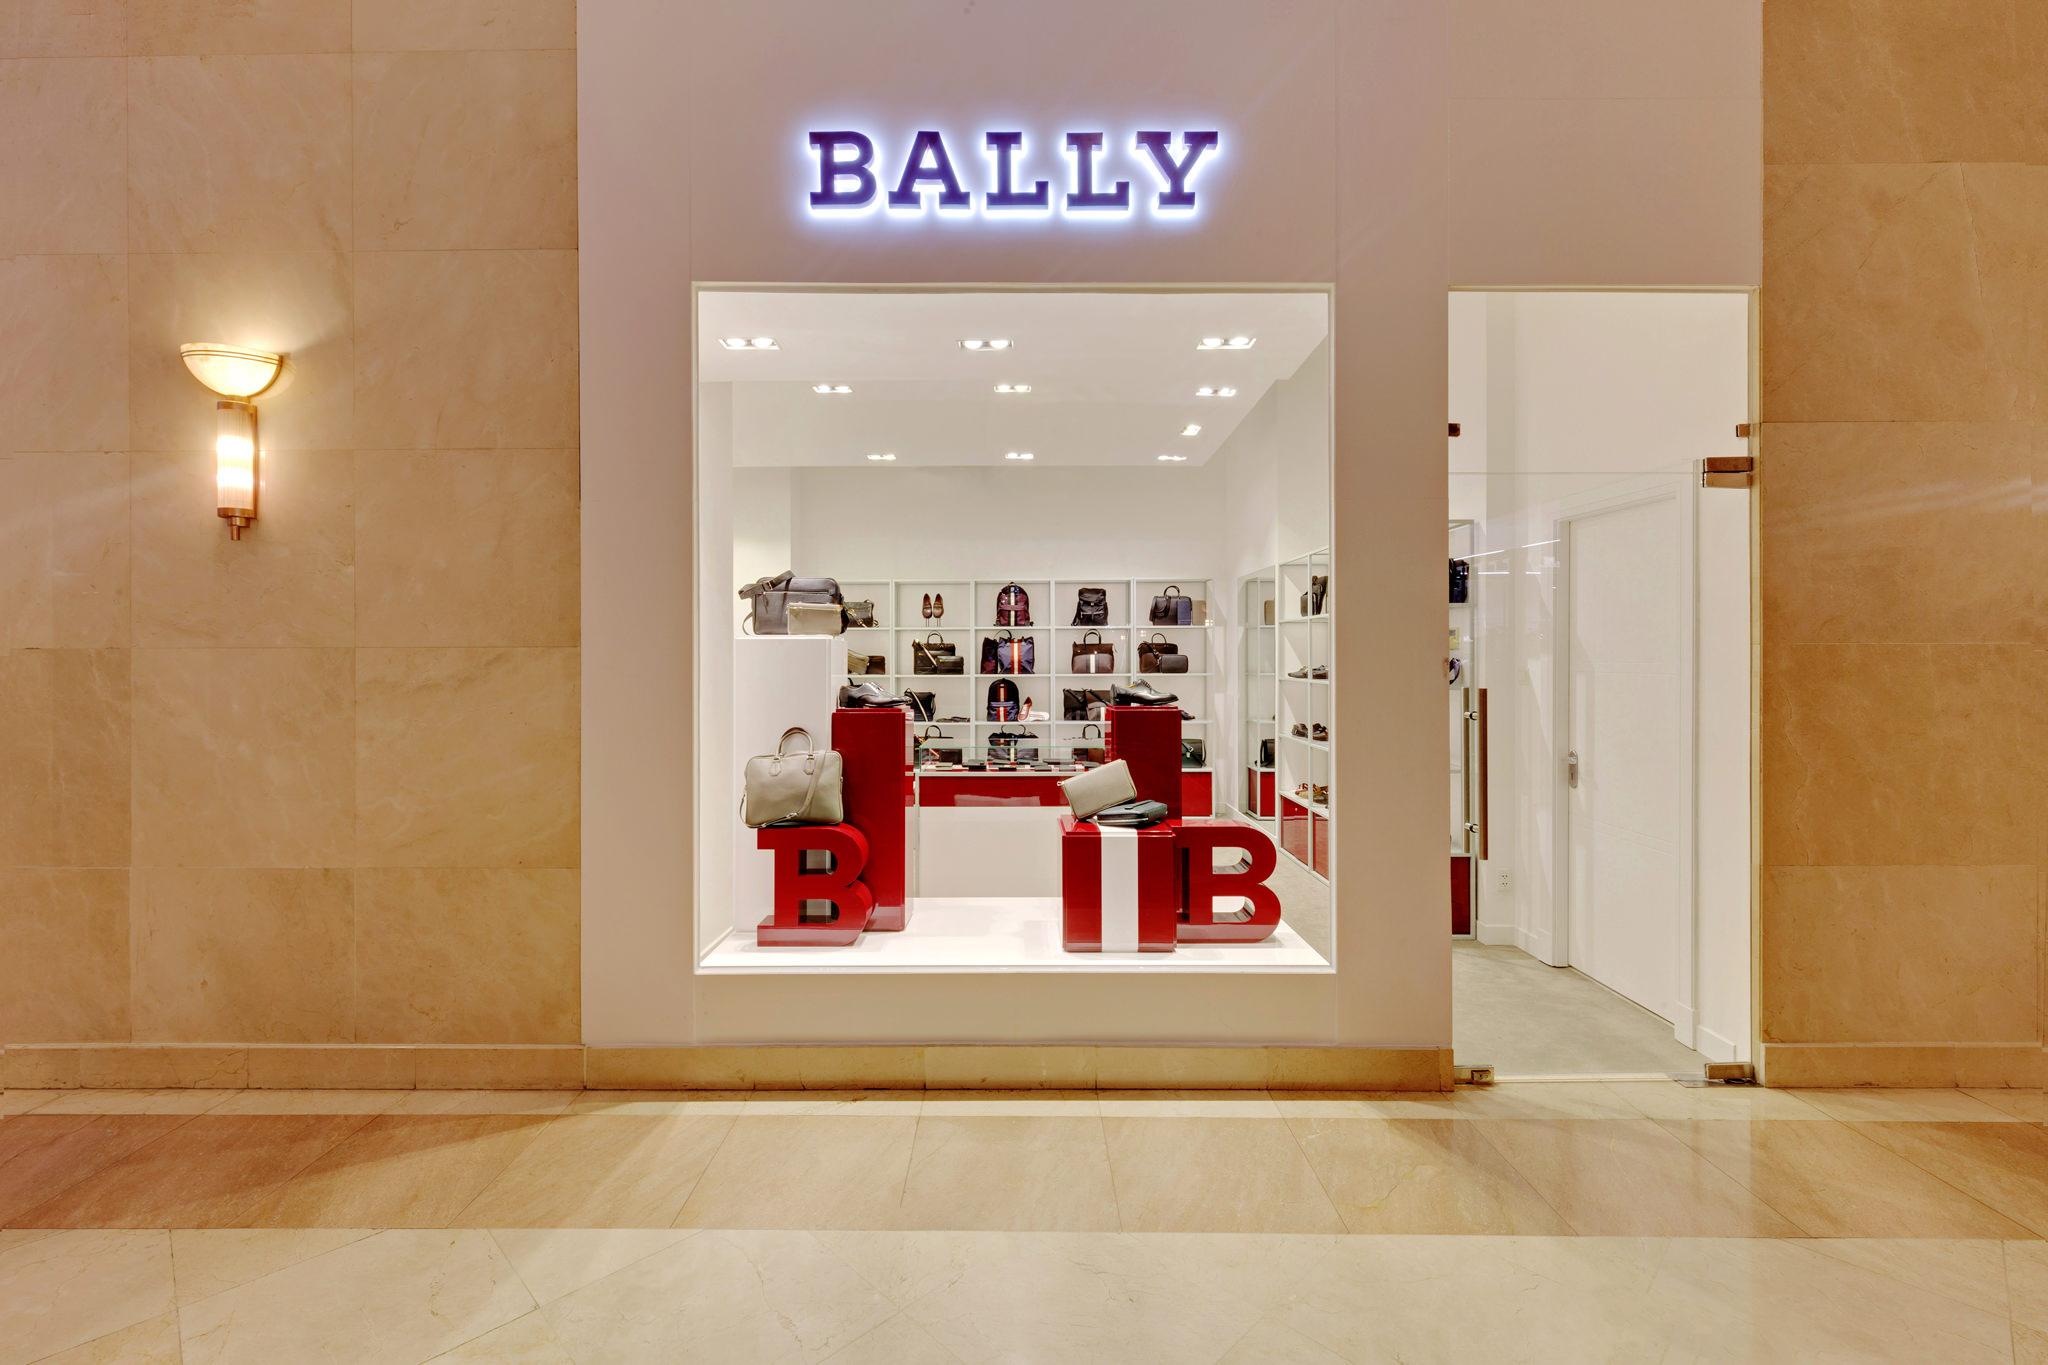 20170316 - Bally - HCM - Commercial - Interior - Store - Retouch 0002.jpg